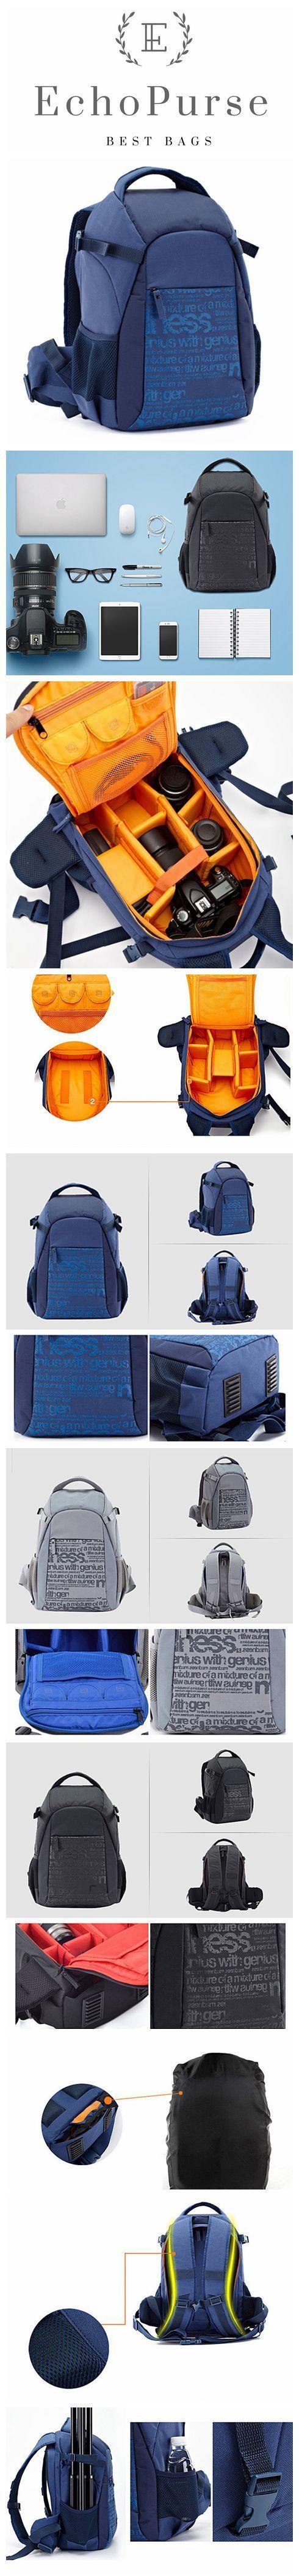 Waterproof Canvas Camera Backpack, Professional DSLR Camera Bag, Travel Backpack S063